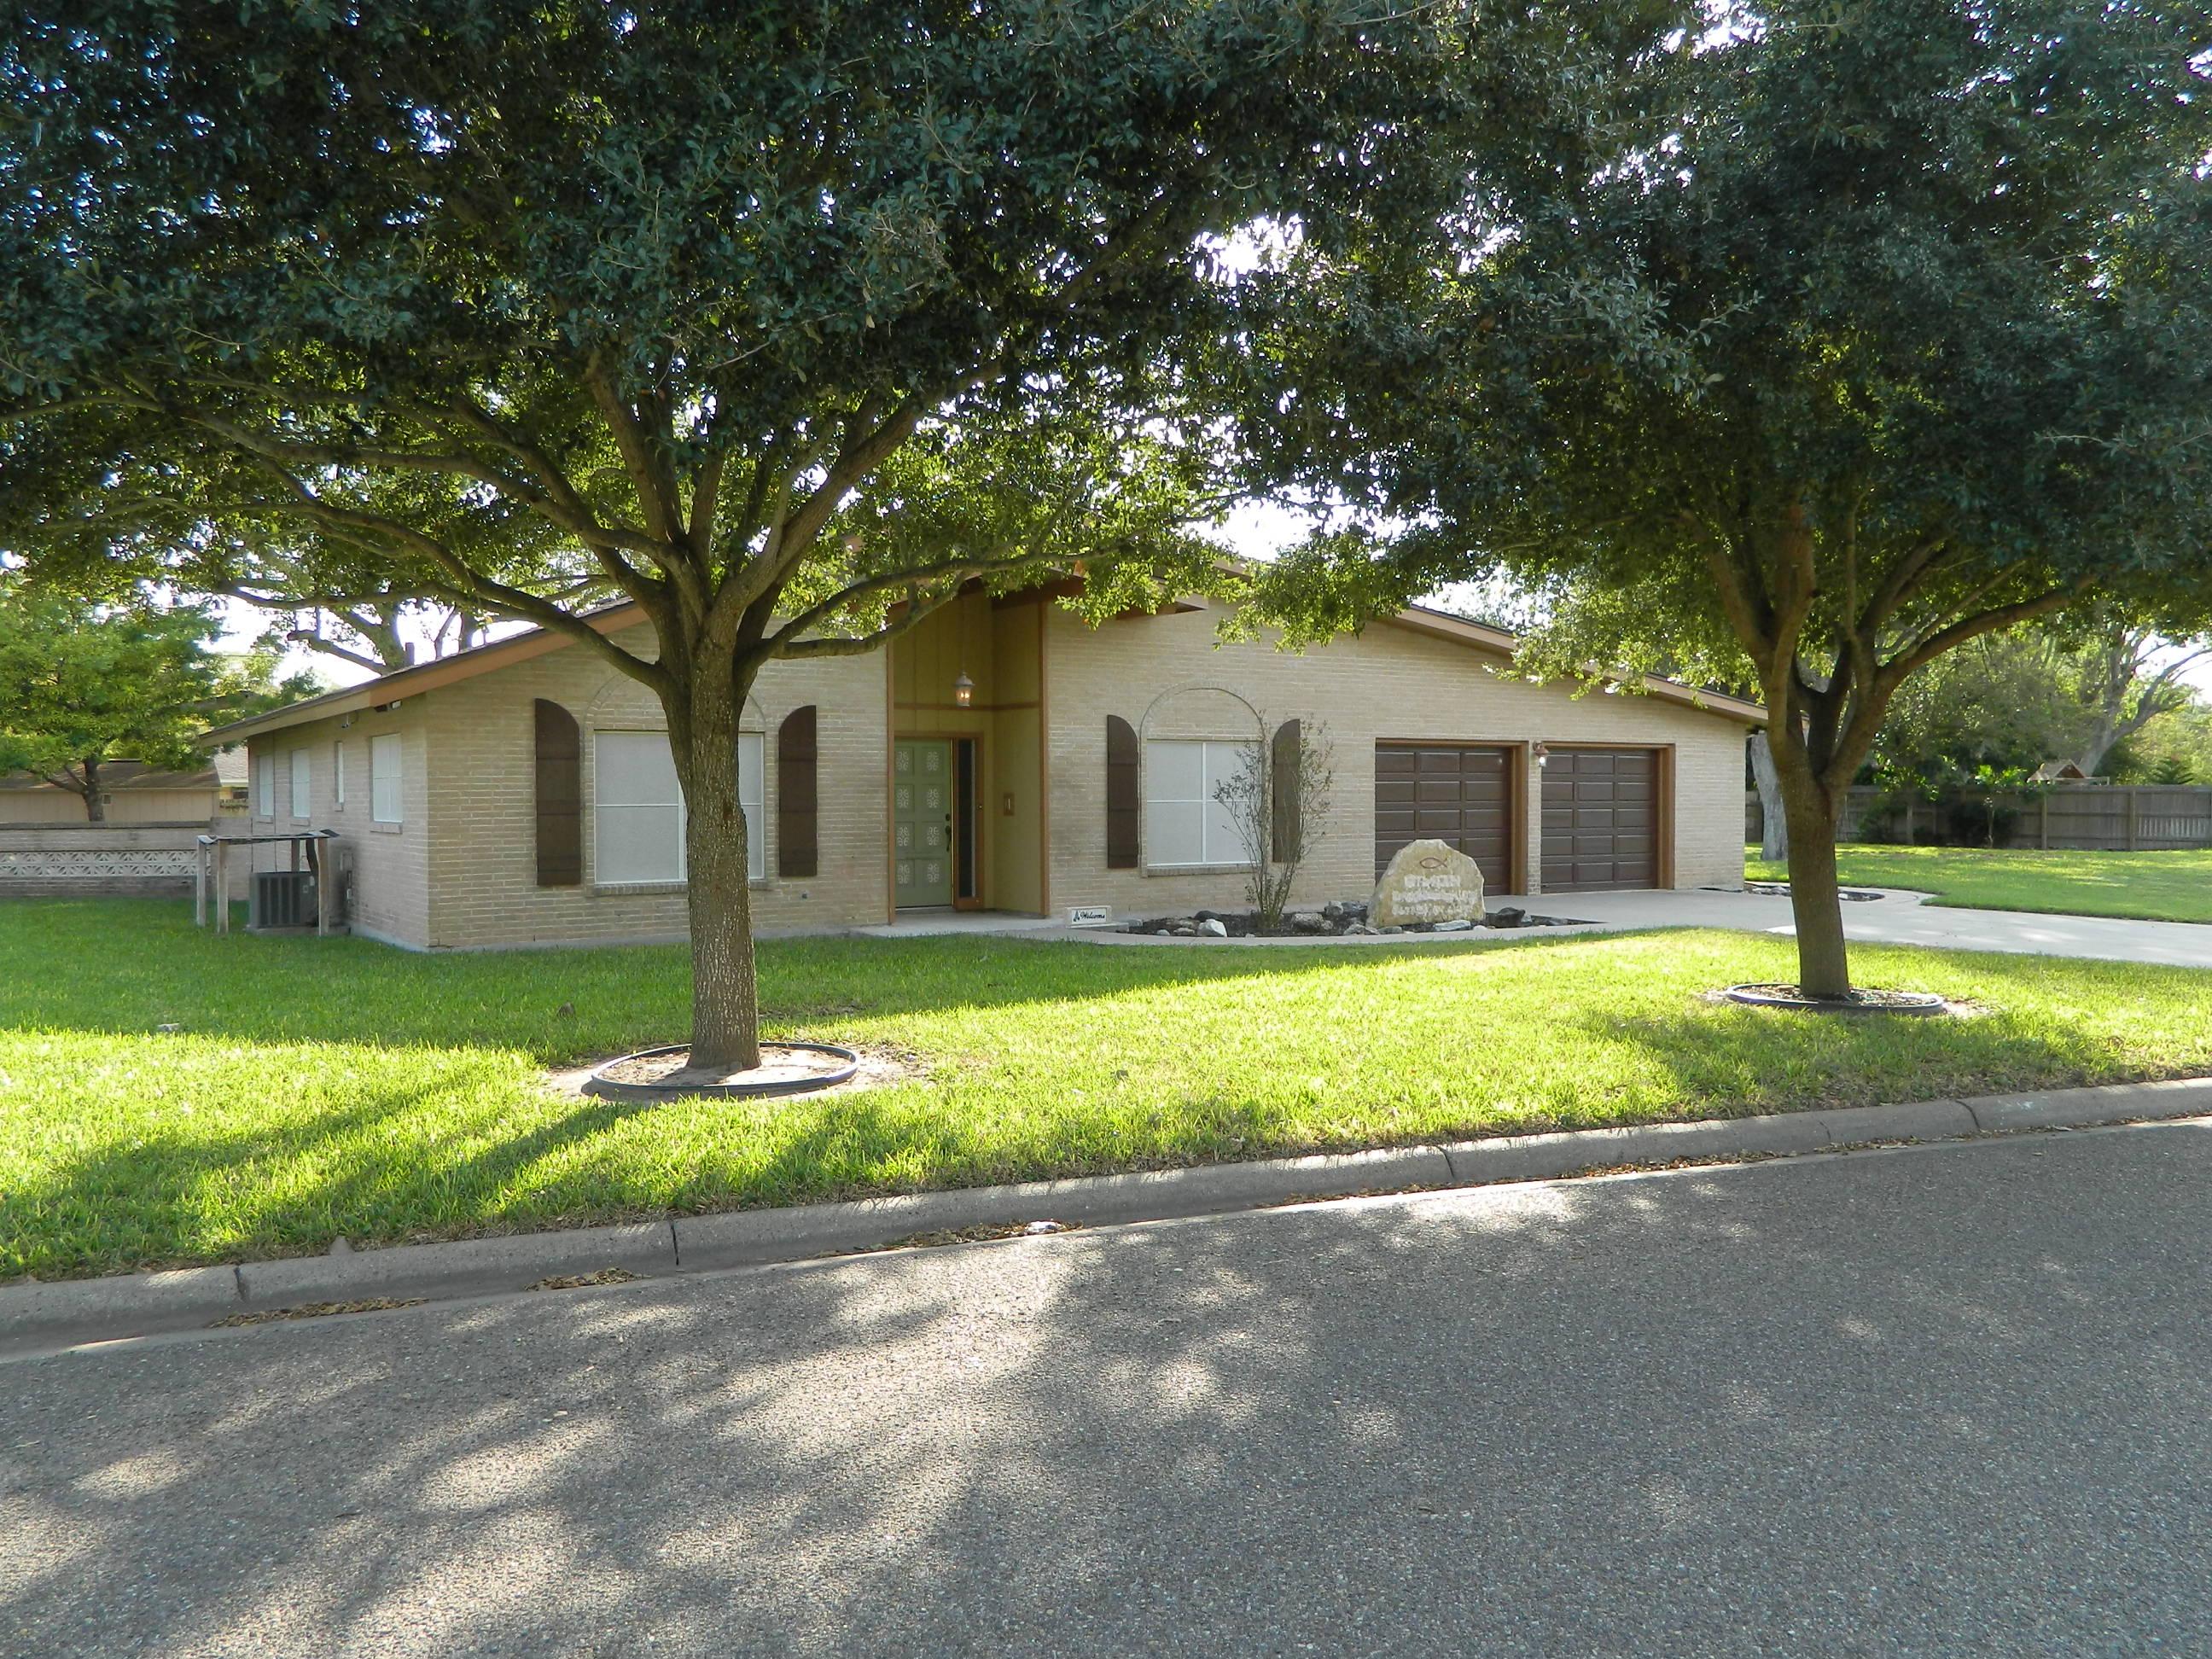 1107 W 3rd, Weslaco, Texas 78596